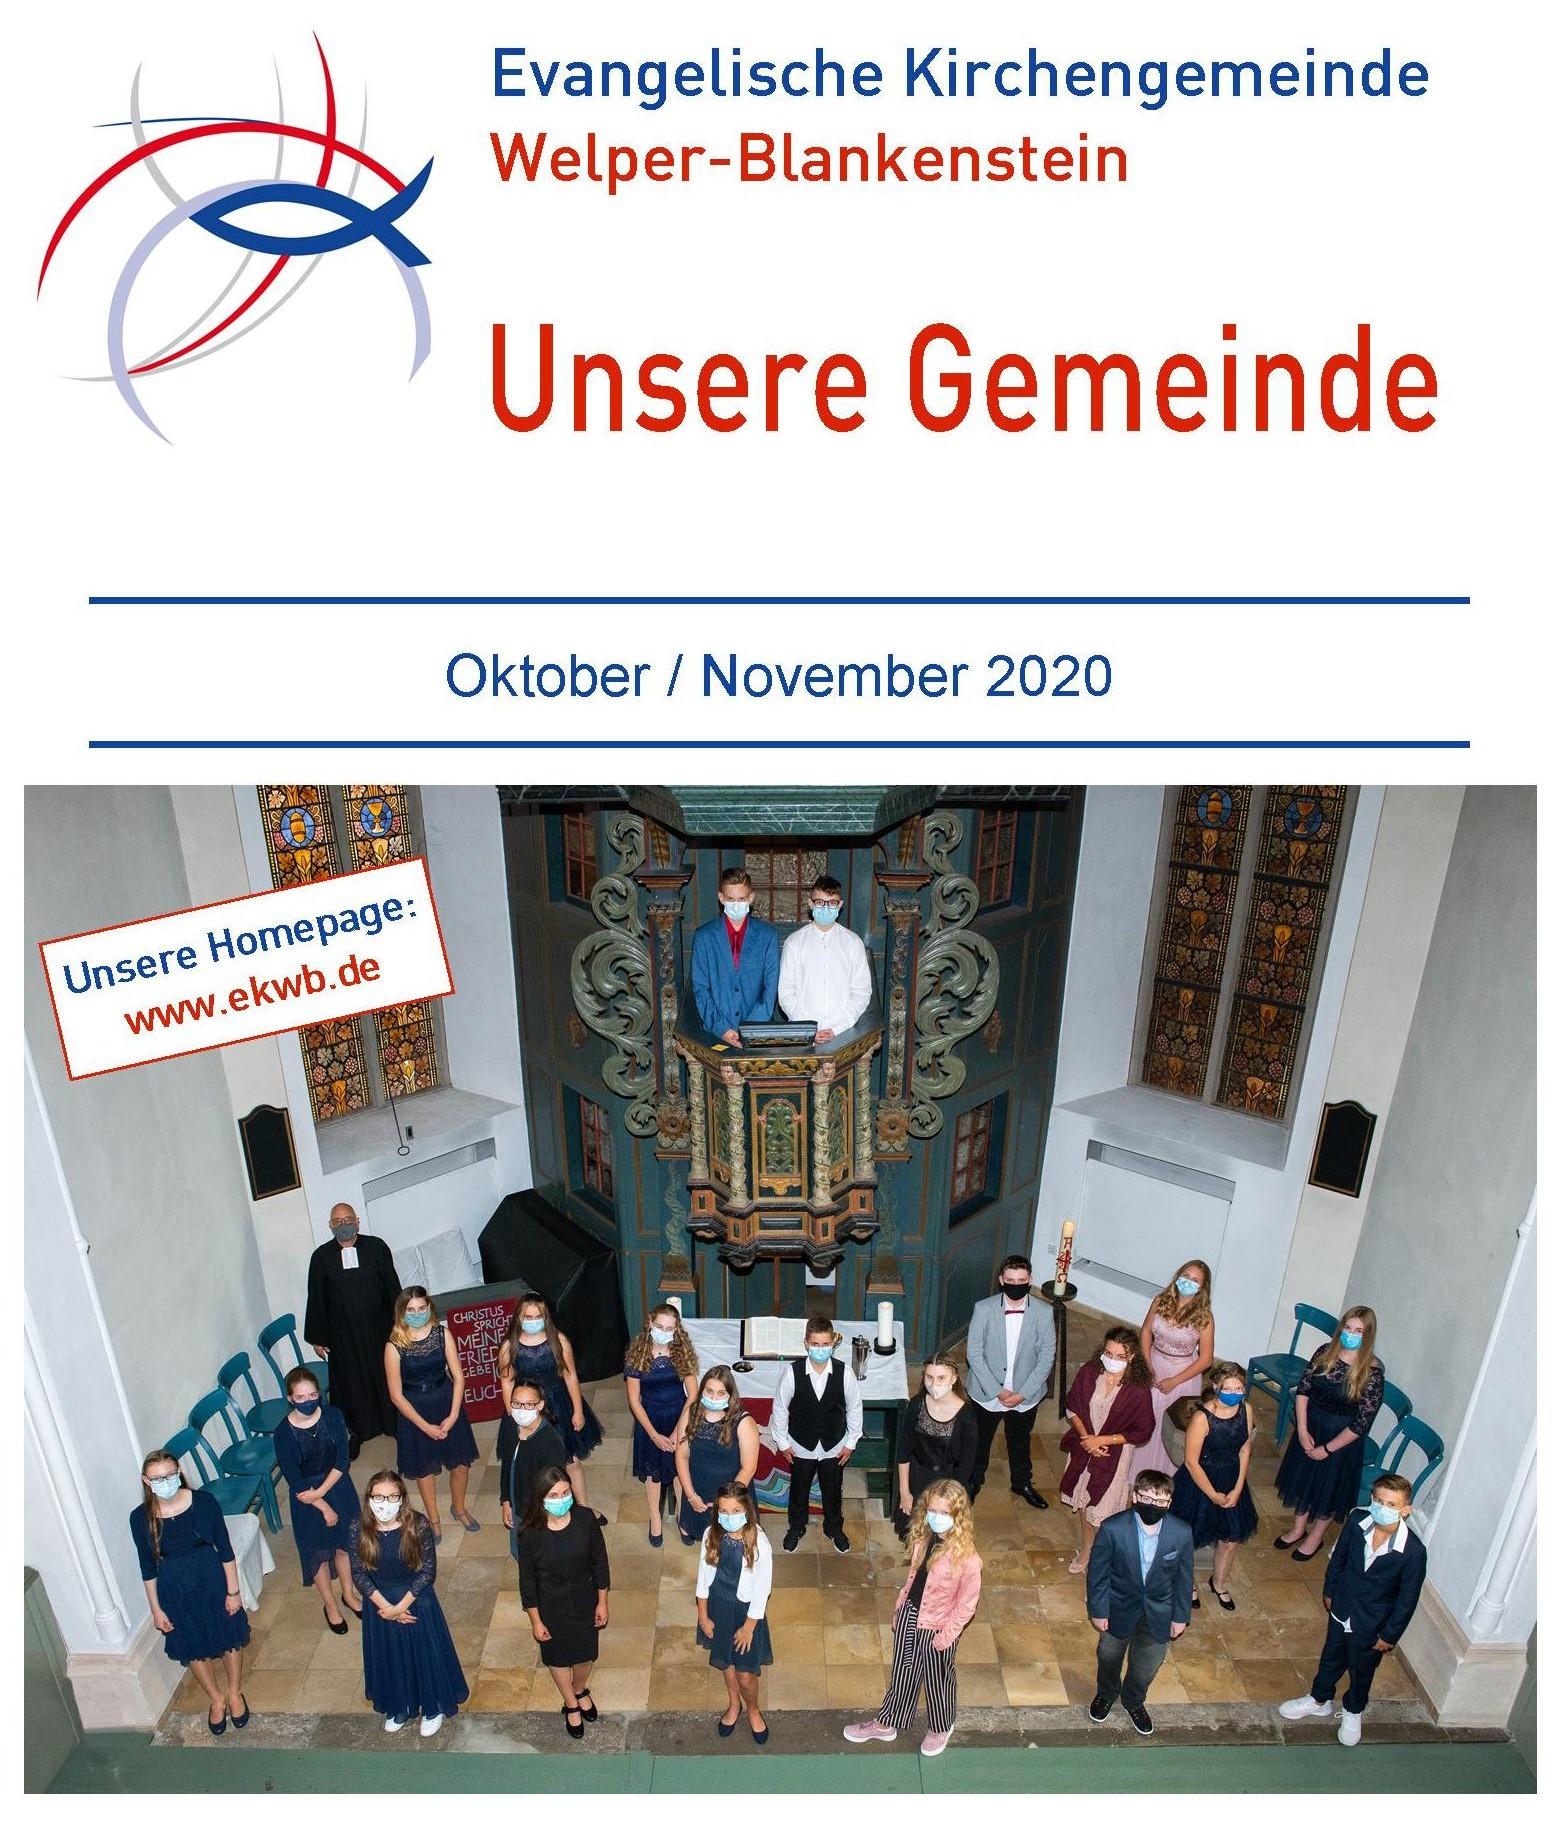 Gemeindebrief Oktober 2020 / November 2020